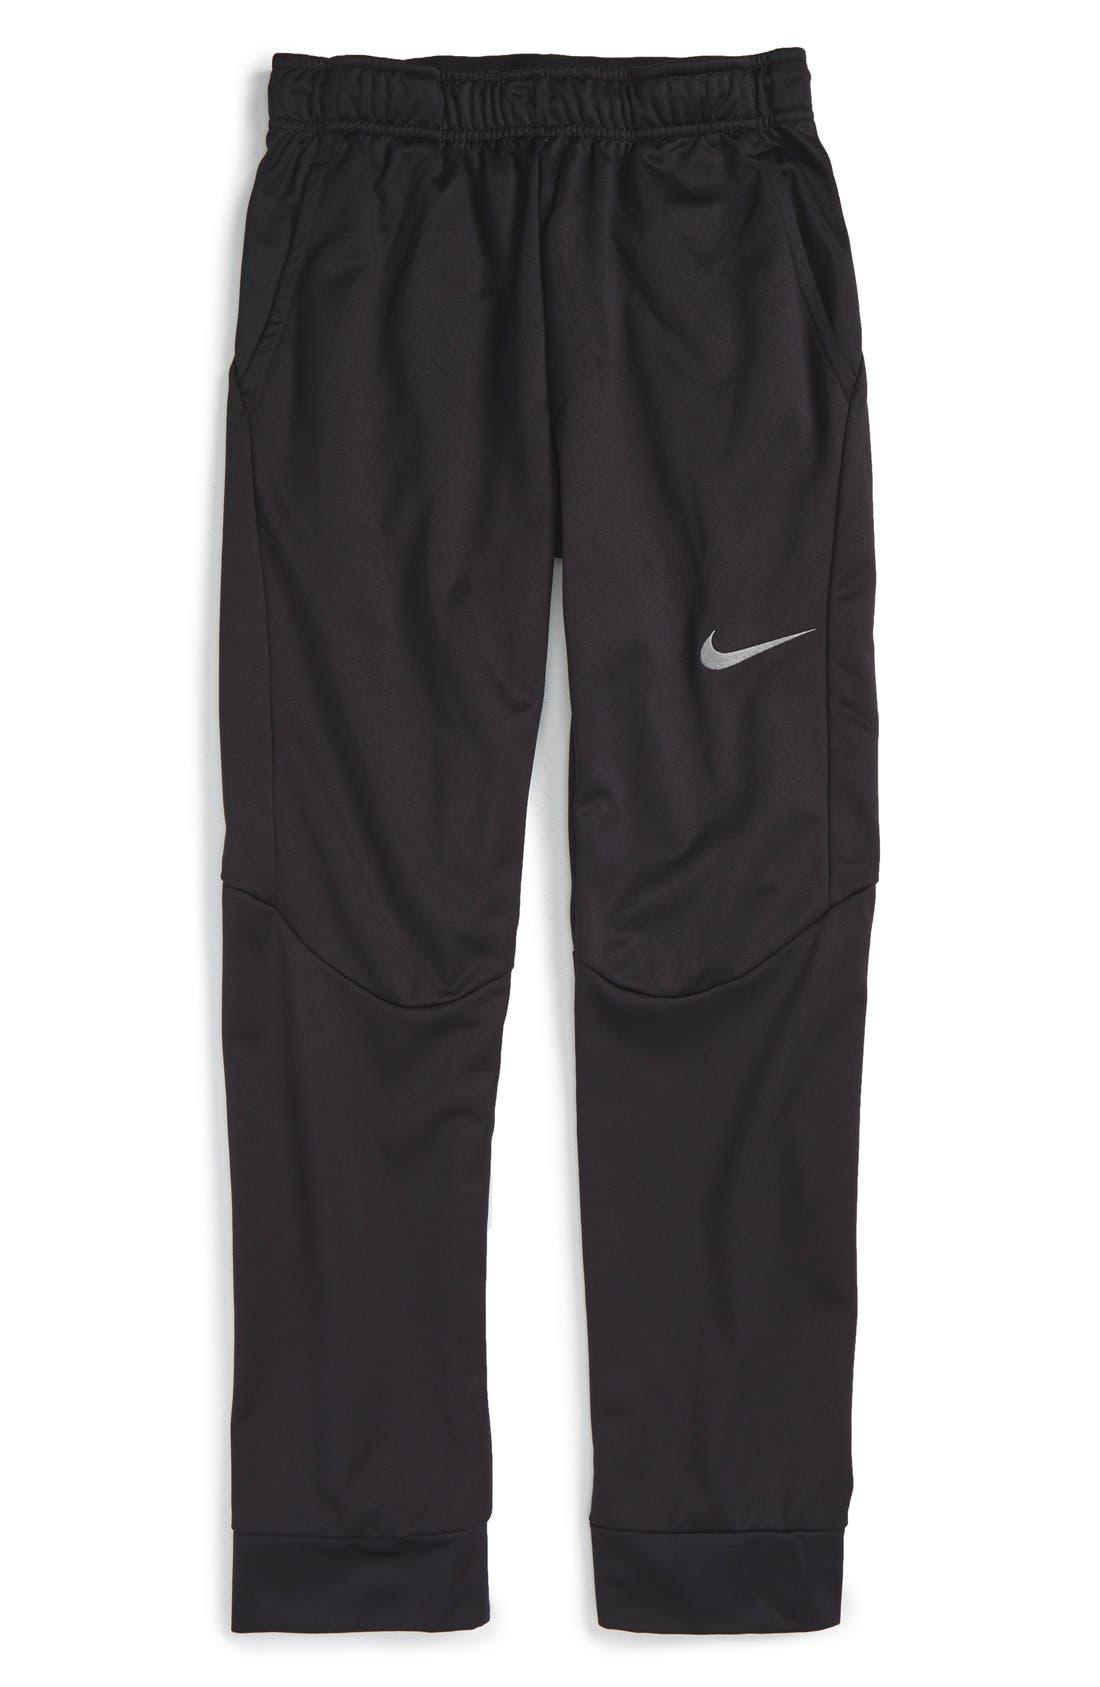 Main Image - Nike Therma-FIT Tapered Fleece Pants (Big Boys)